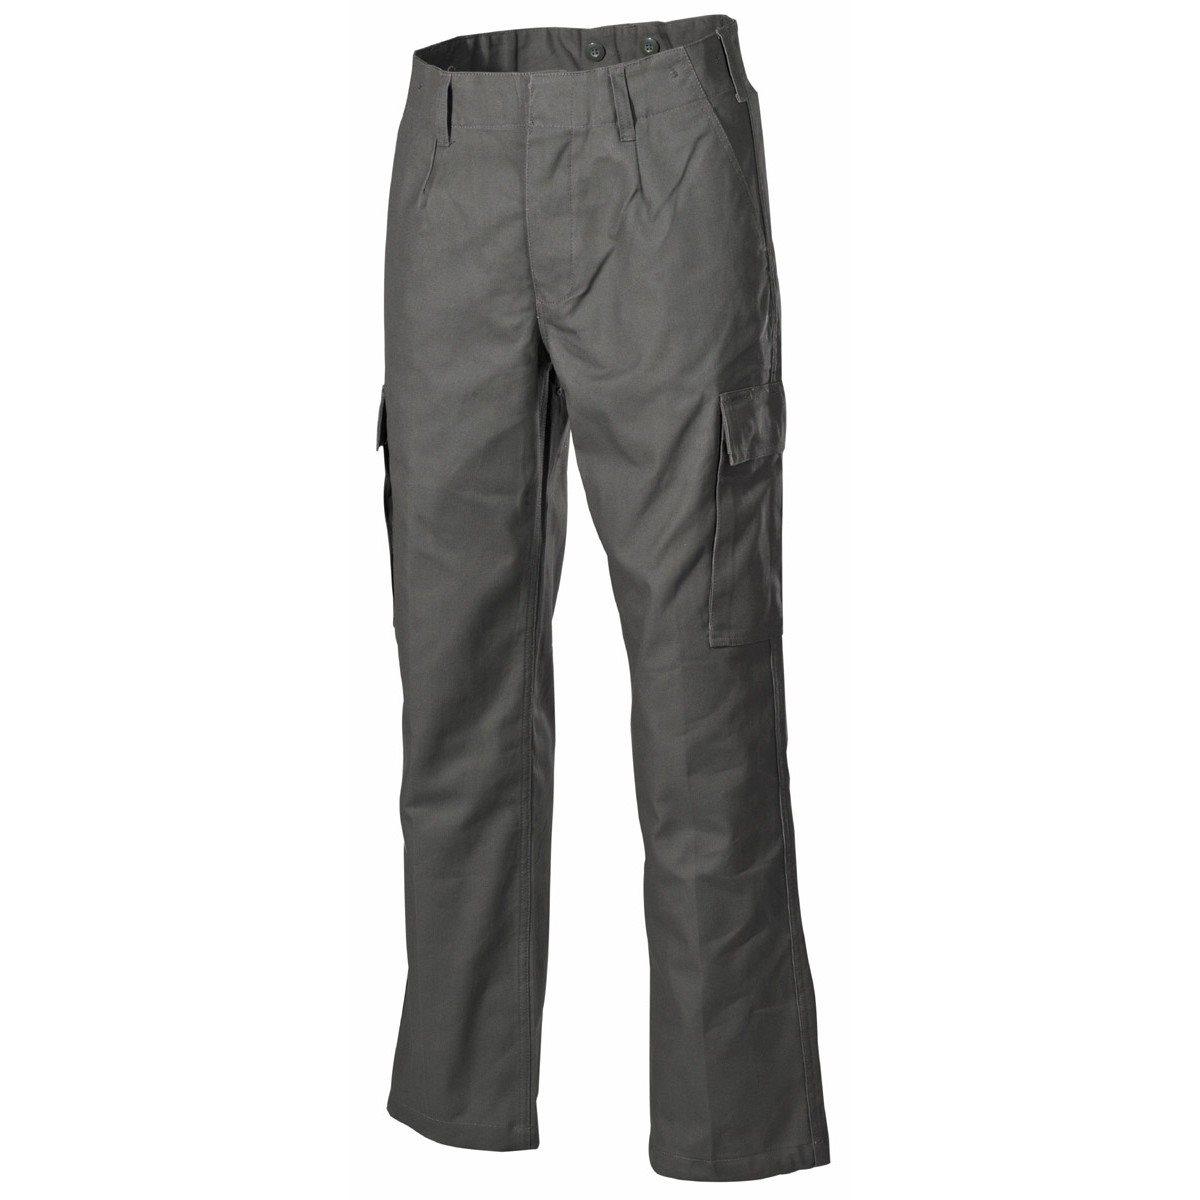 BW moleskin pants OLIVE MFH int. comp. 01101B L-11